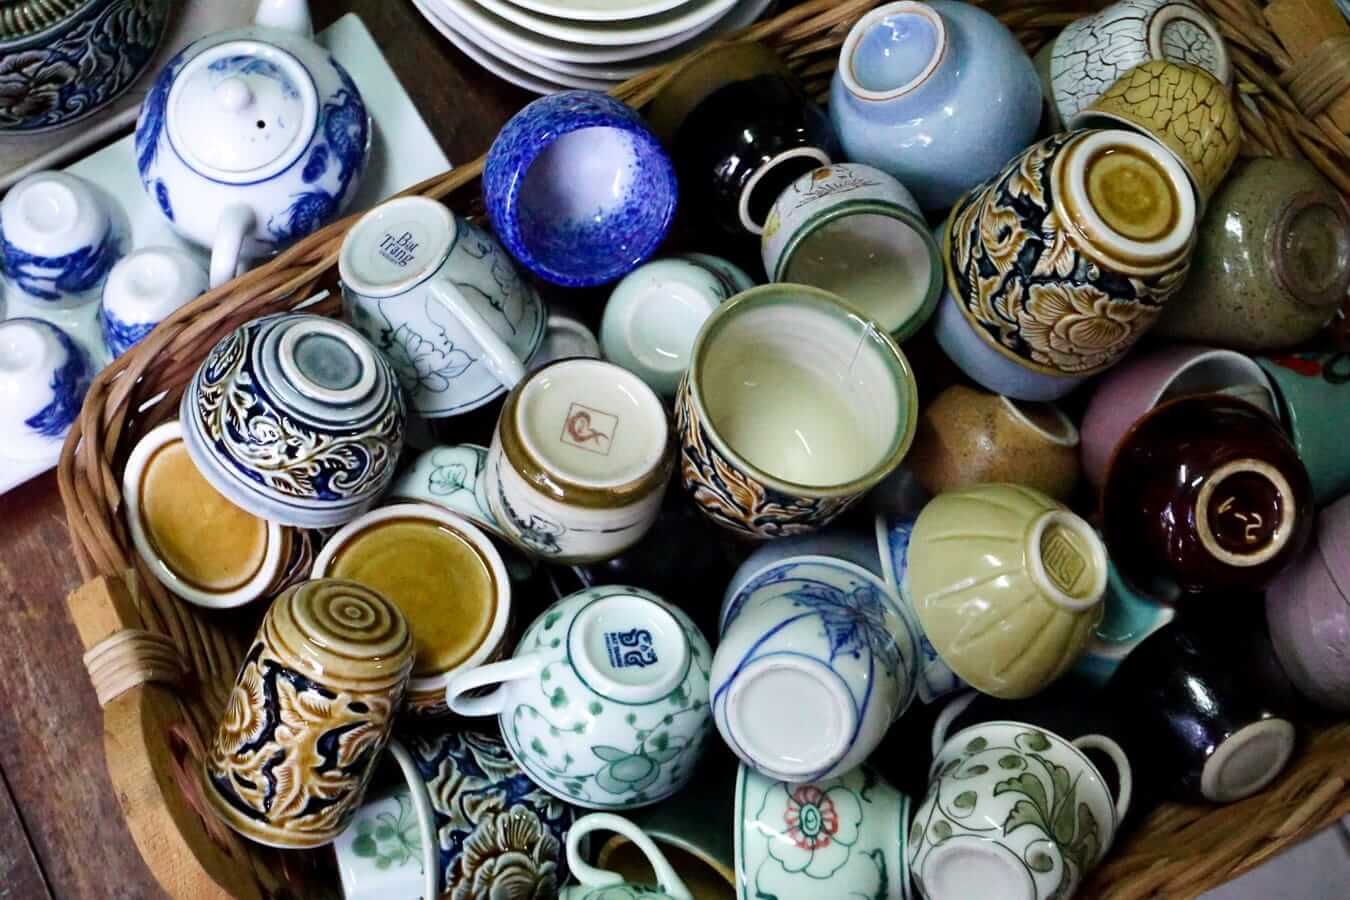 Pottery Nam Tran: Hoi An souvenirs